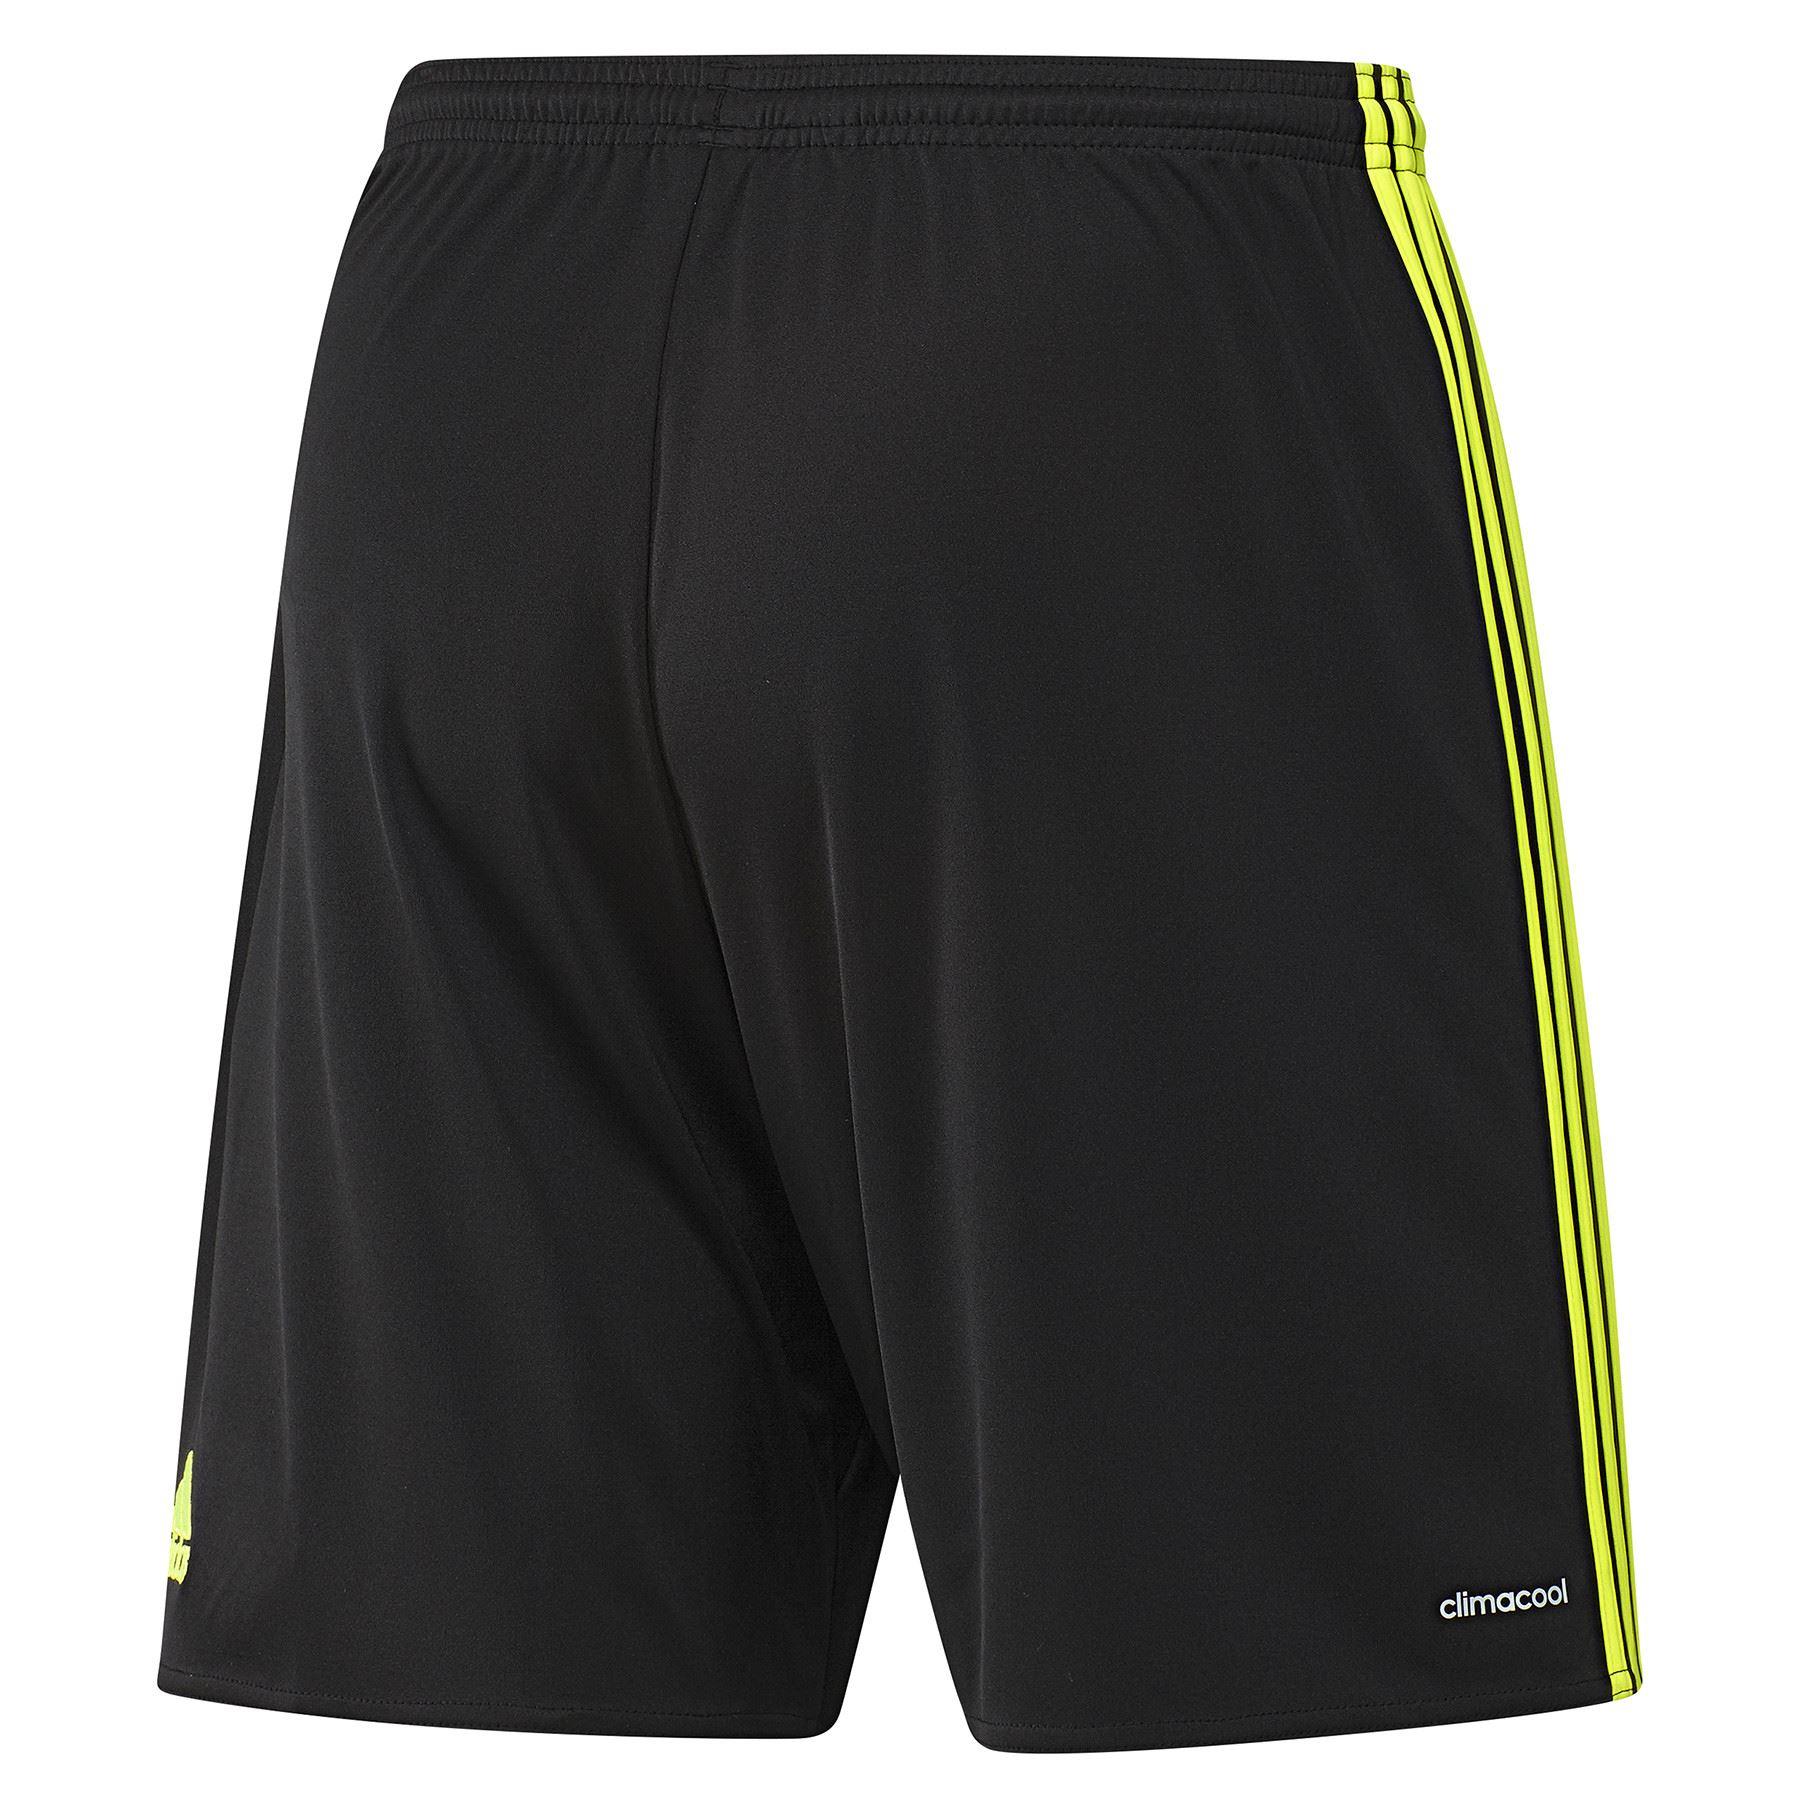 Adidas HOMME Football Short Climacool Adizero Manchester United Suède Belgique